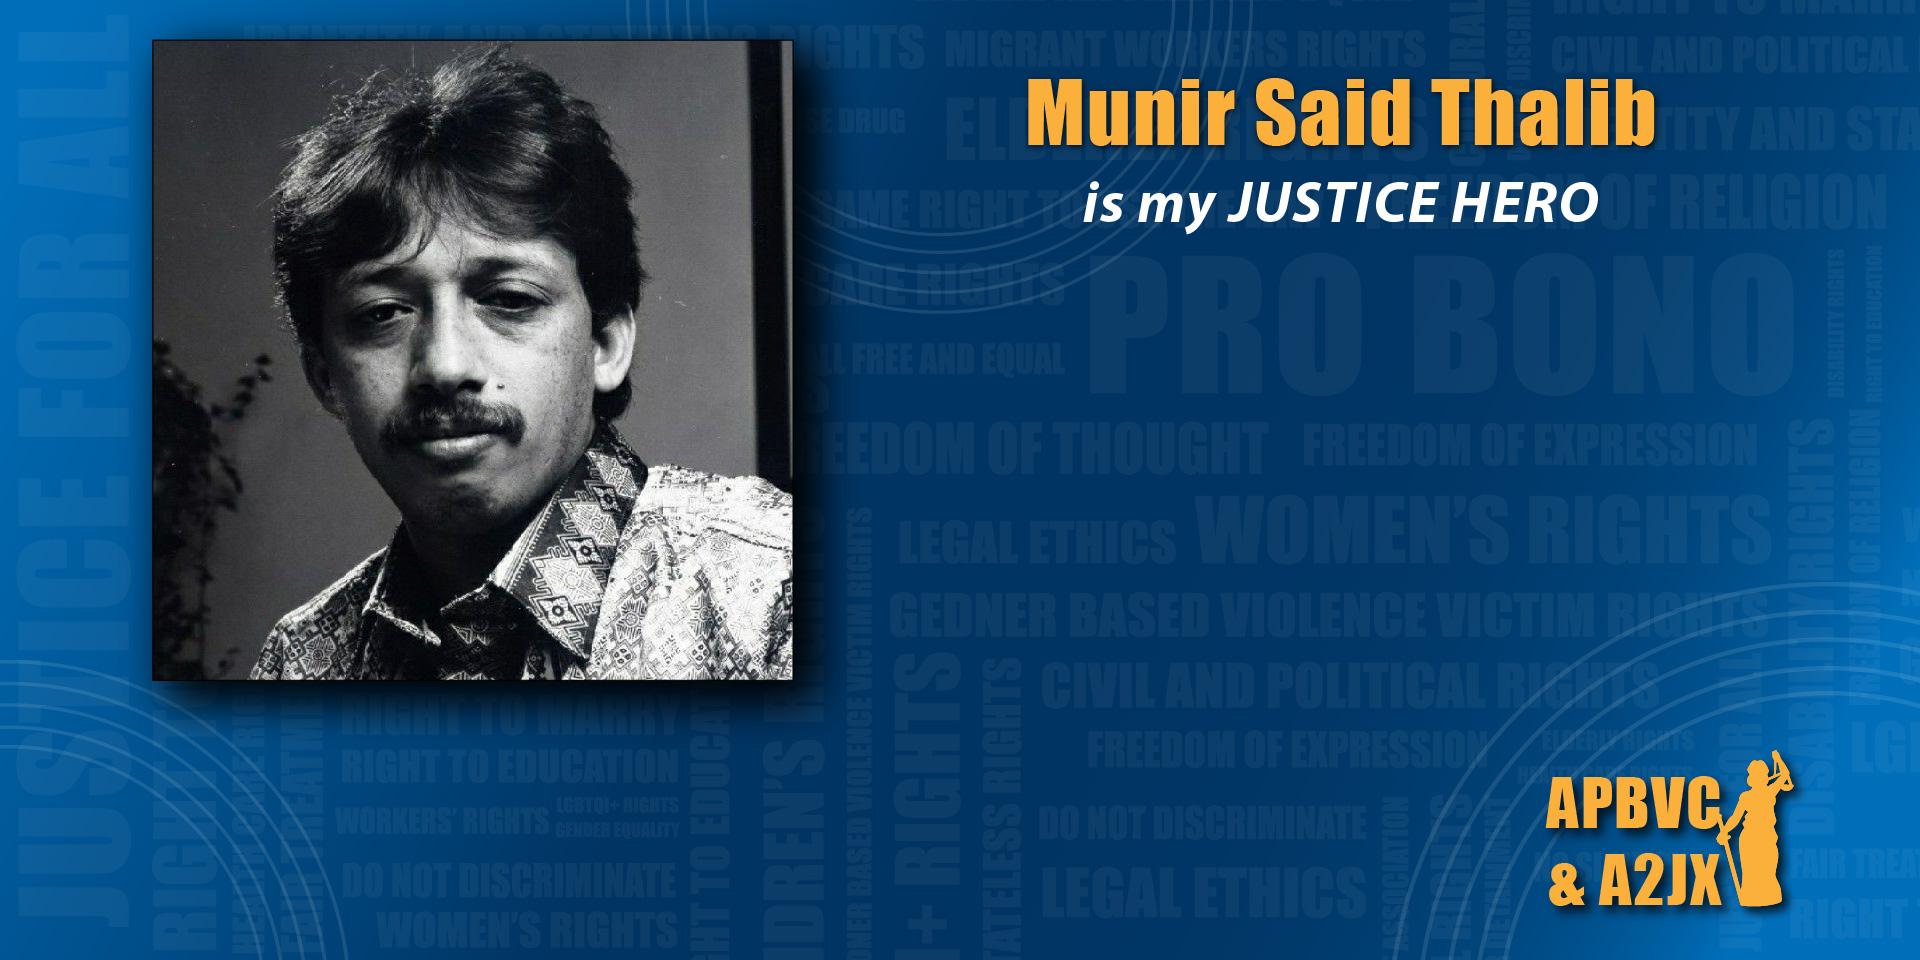 Munir Said Thalib